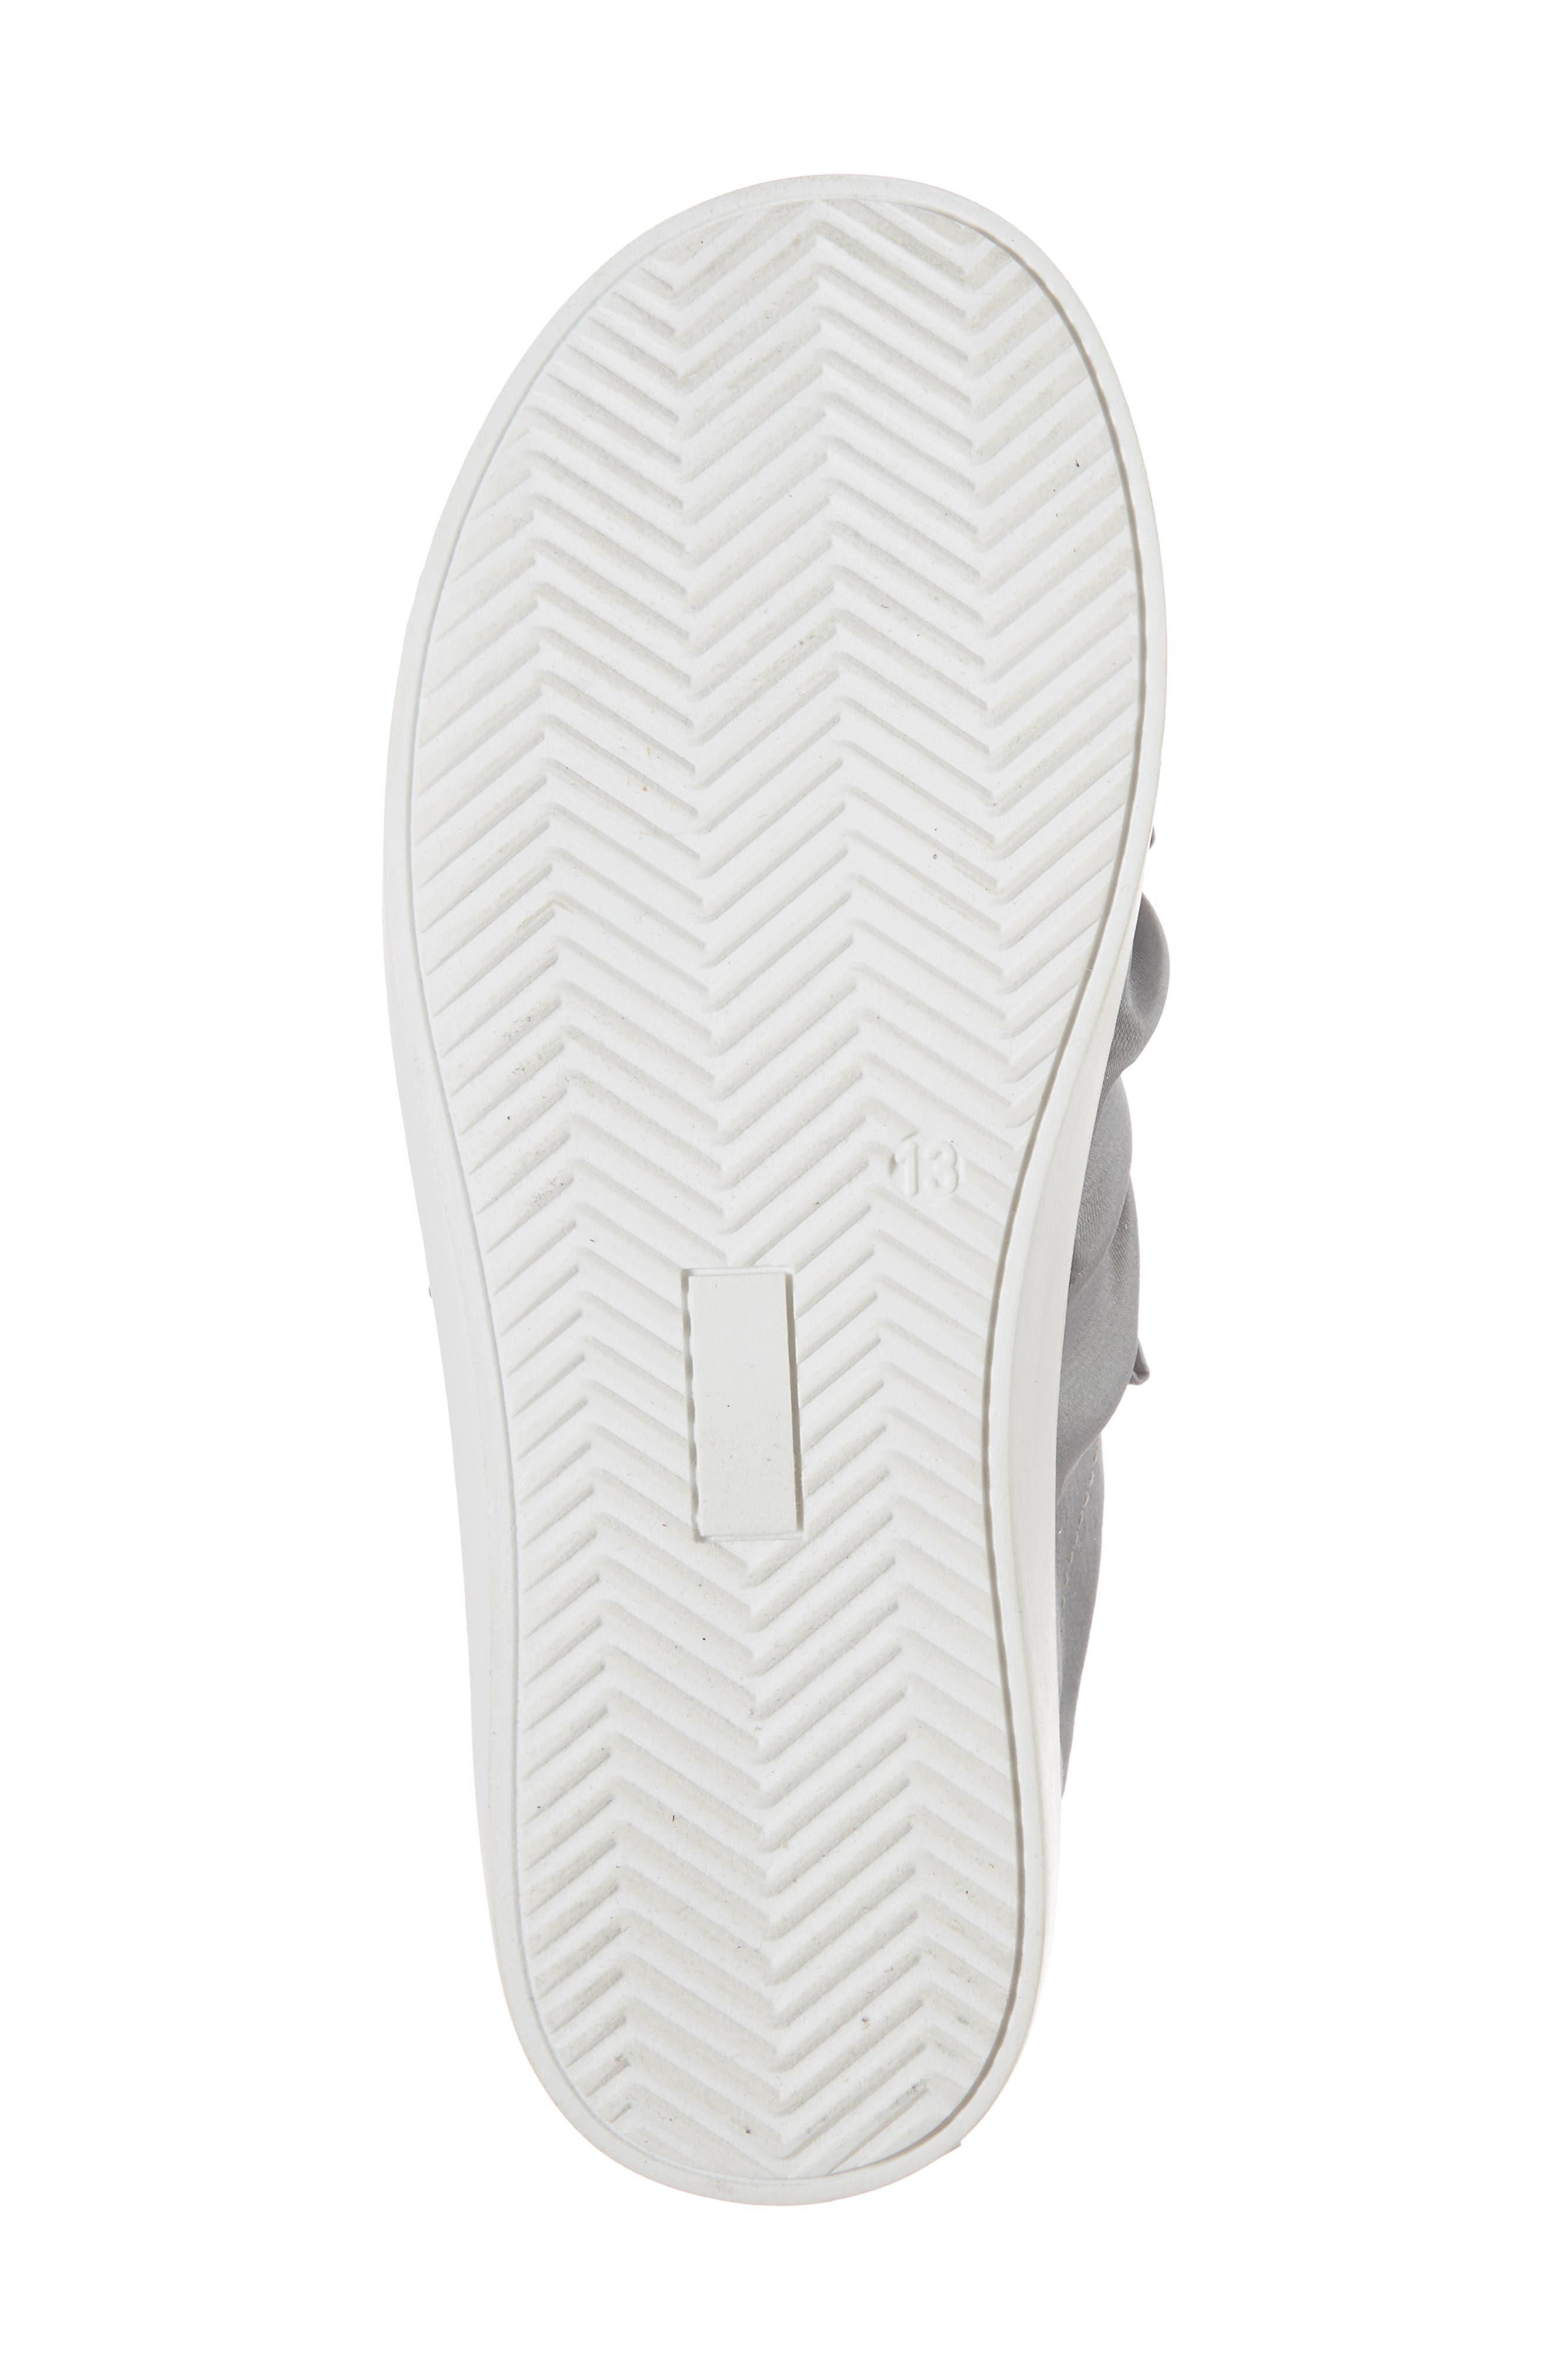 Shout Shine Embellished Sneaker,                             Alternate thumbnail 6, color,                             Gray